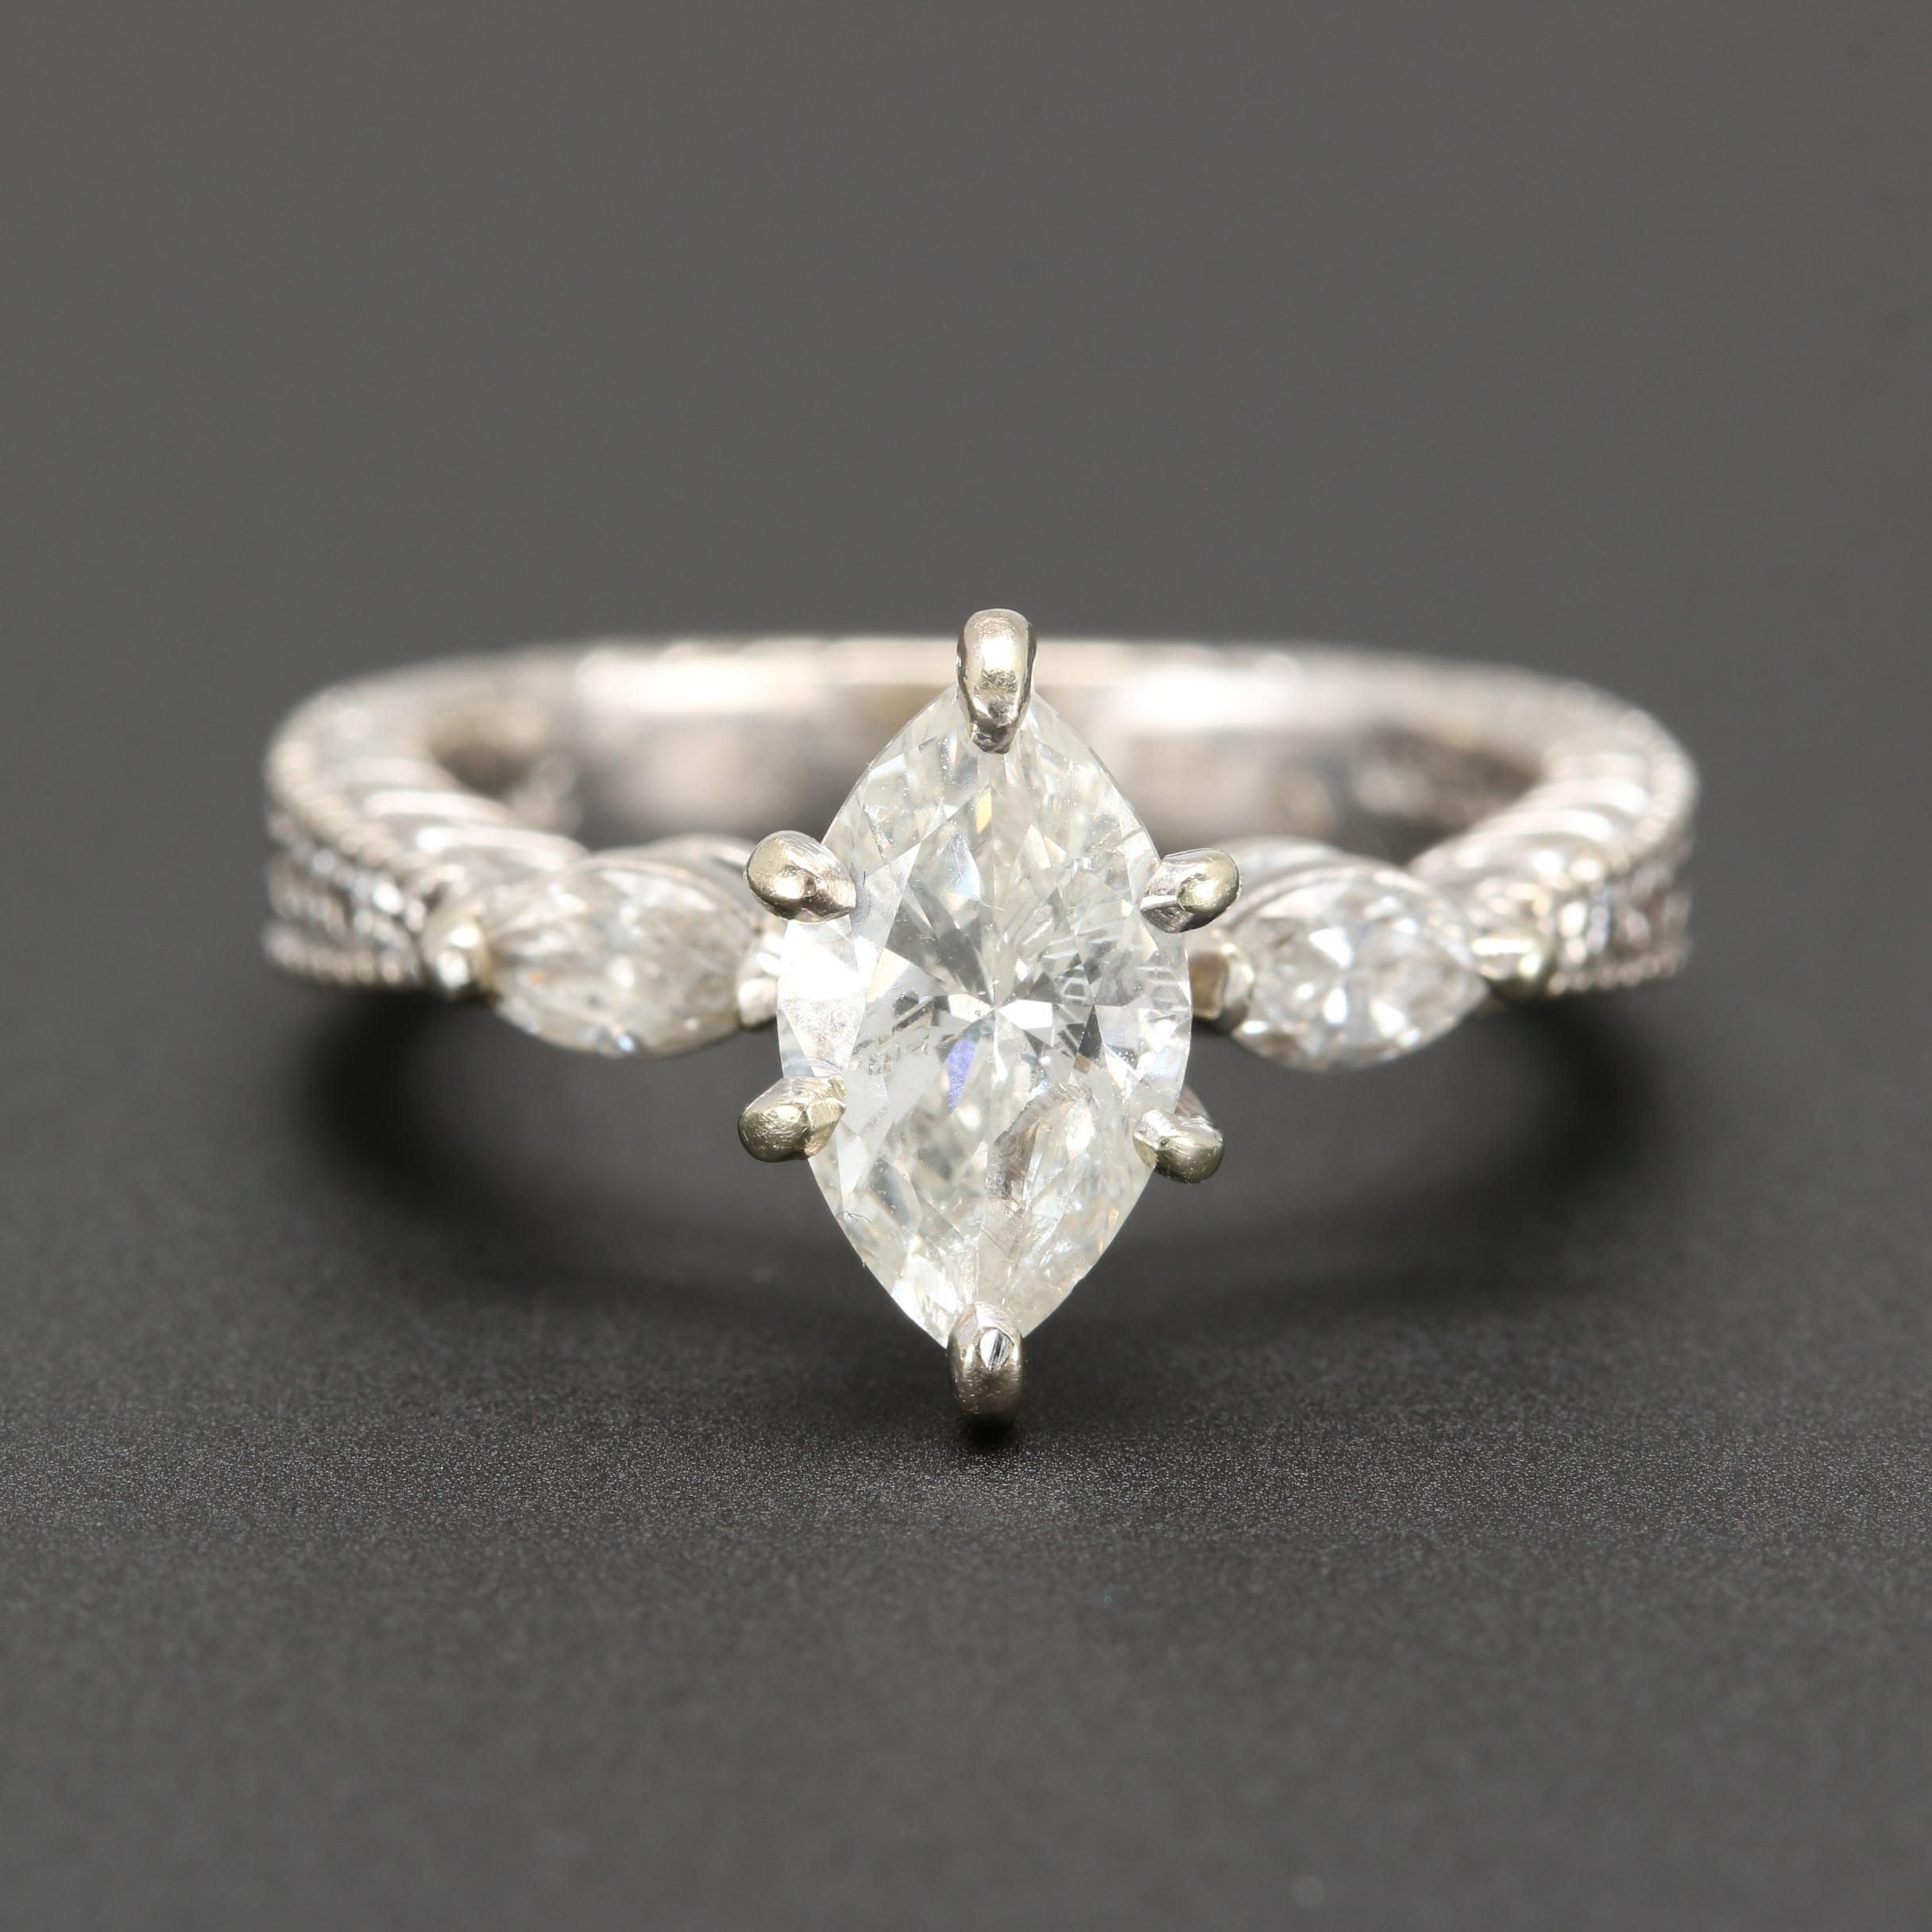 14K White Gold 1.15 CTW Diamond Ring